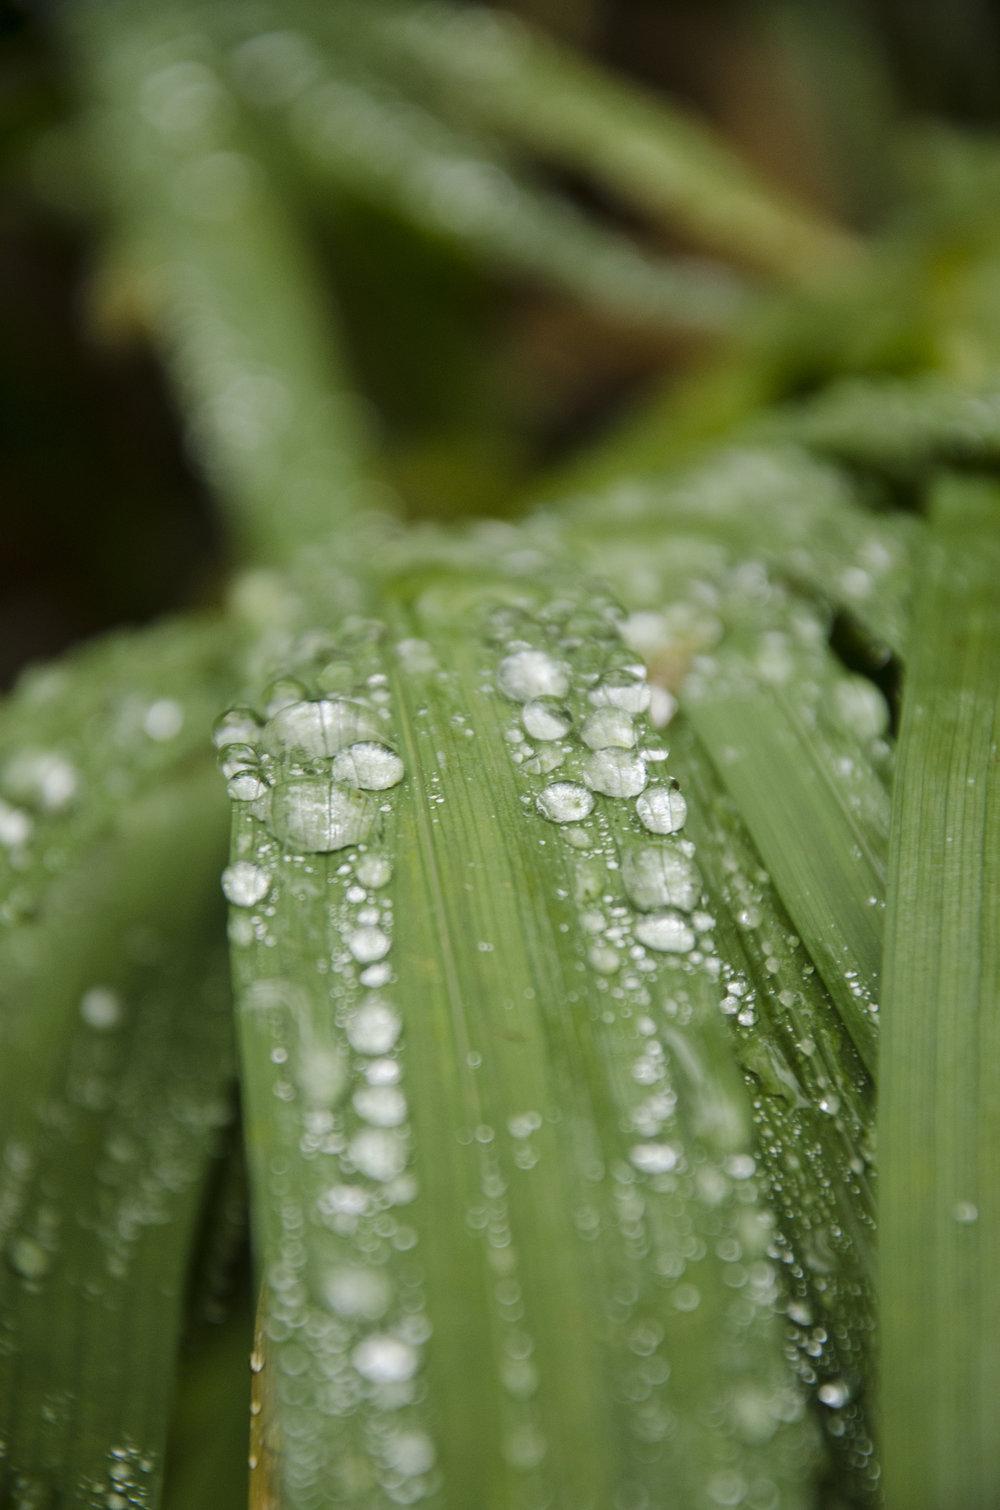 Water on Leaf